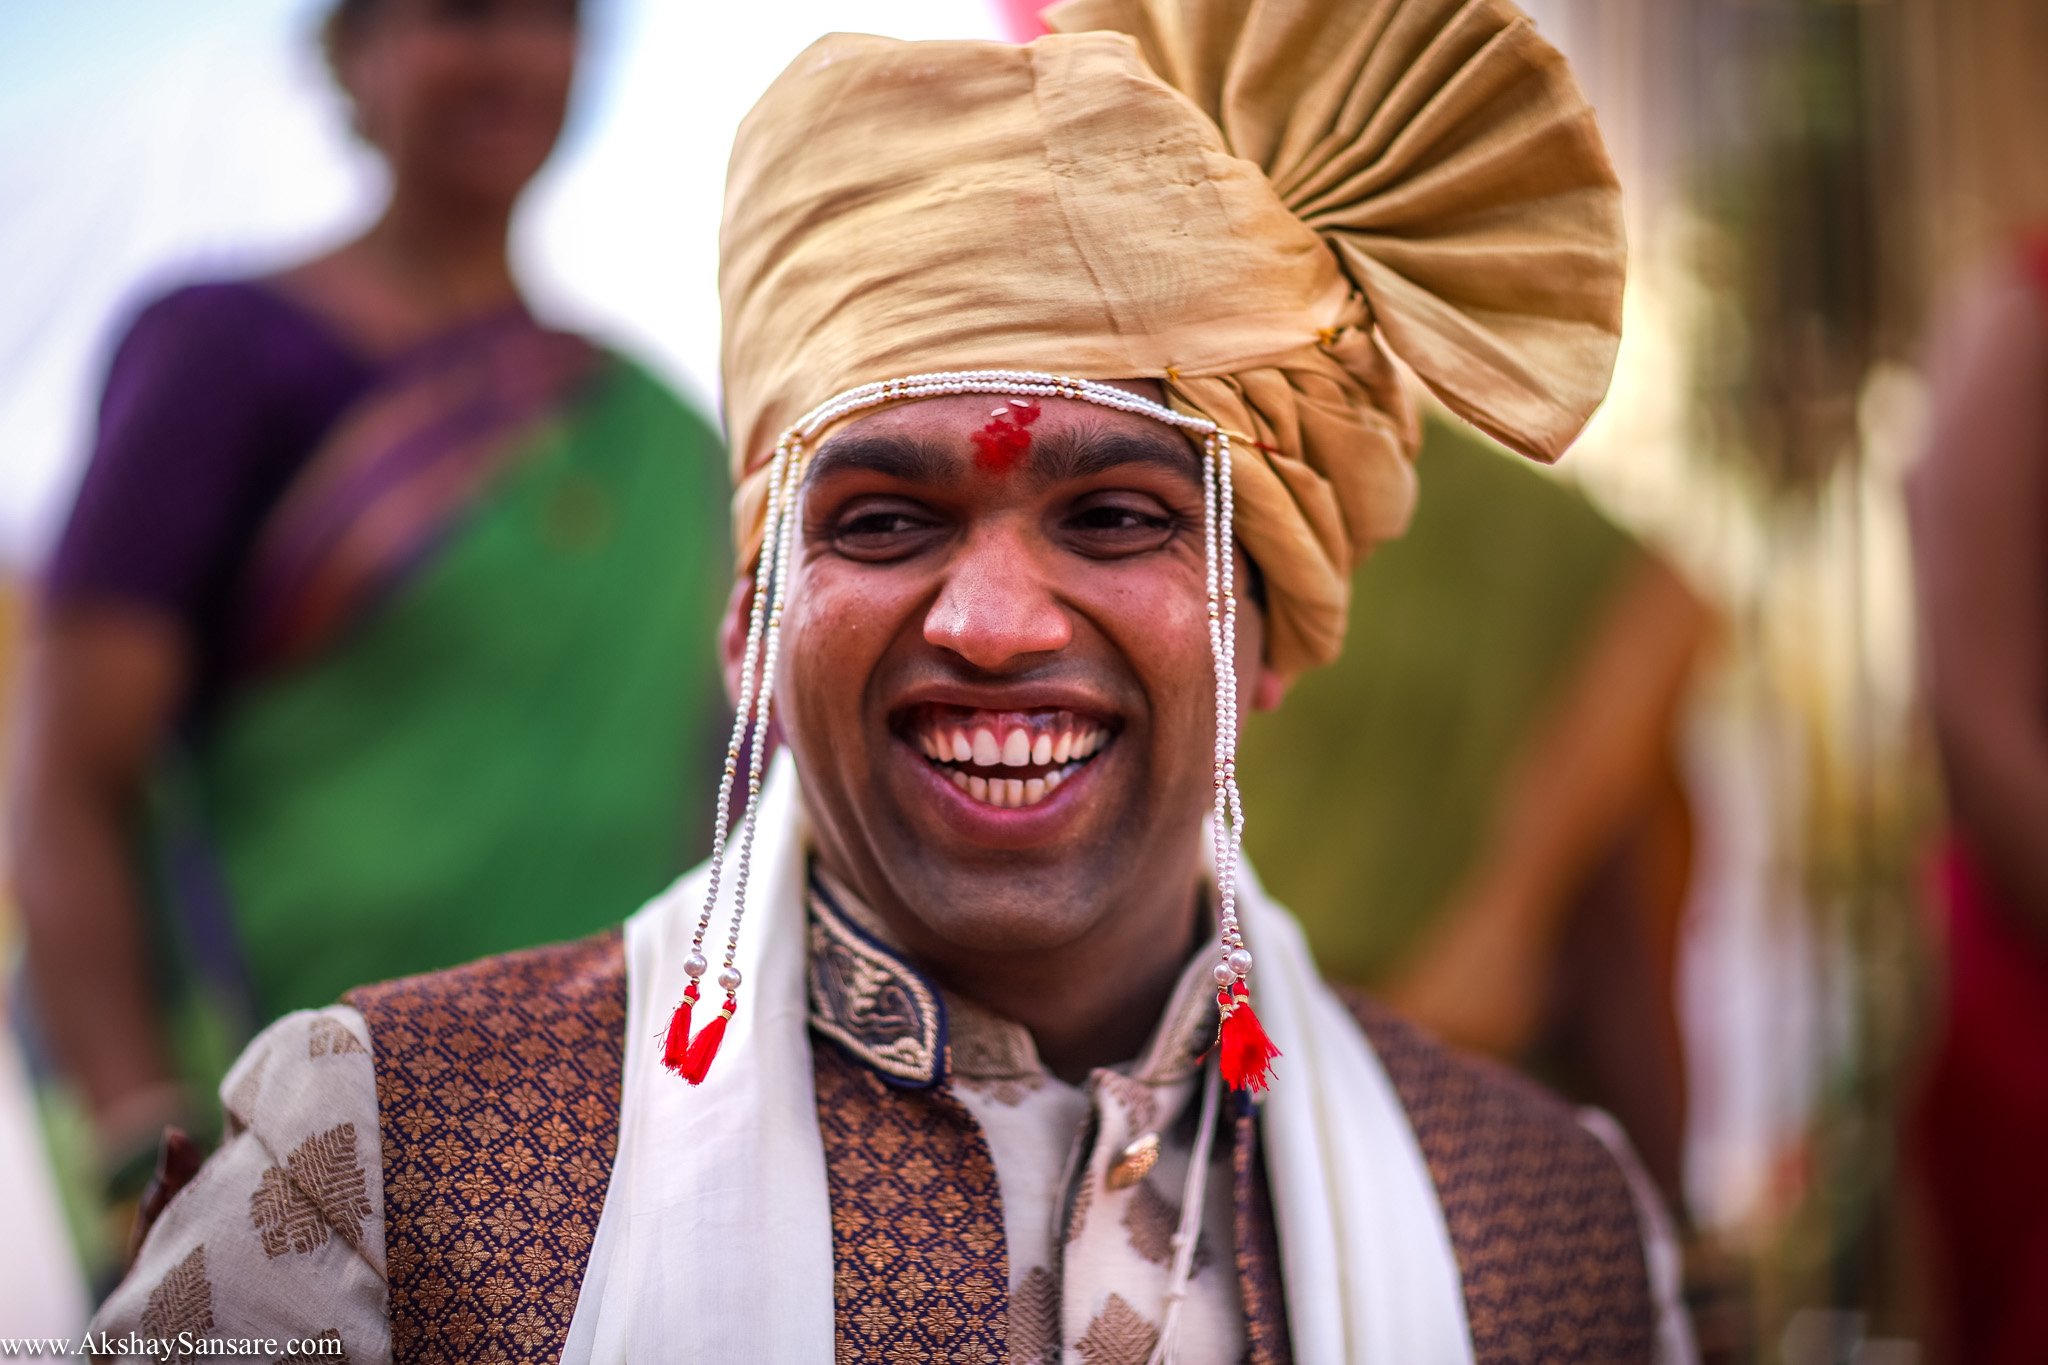 Salil x Kimaya Akshay Sansare Photography Candid wedding Photographer in mumbai best(25).jpg